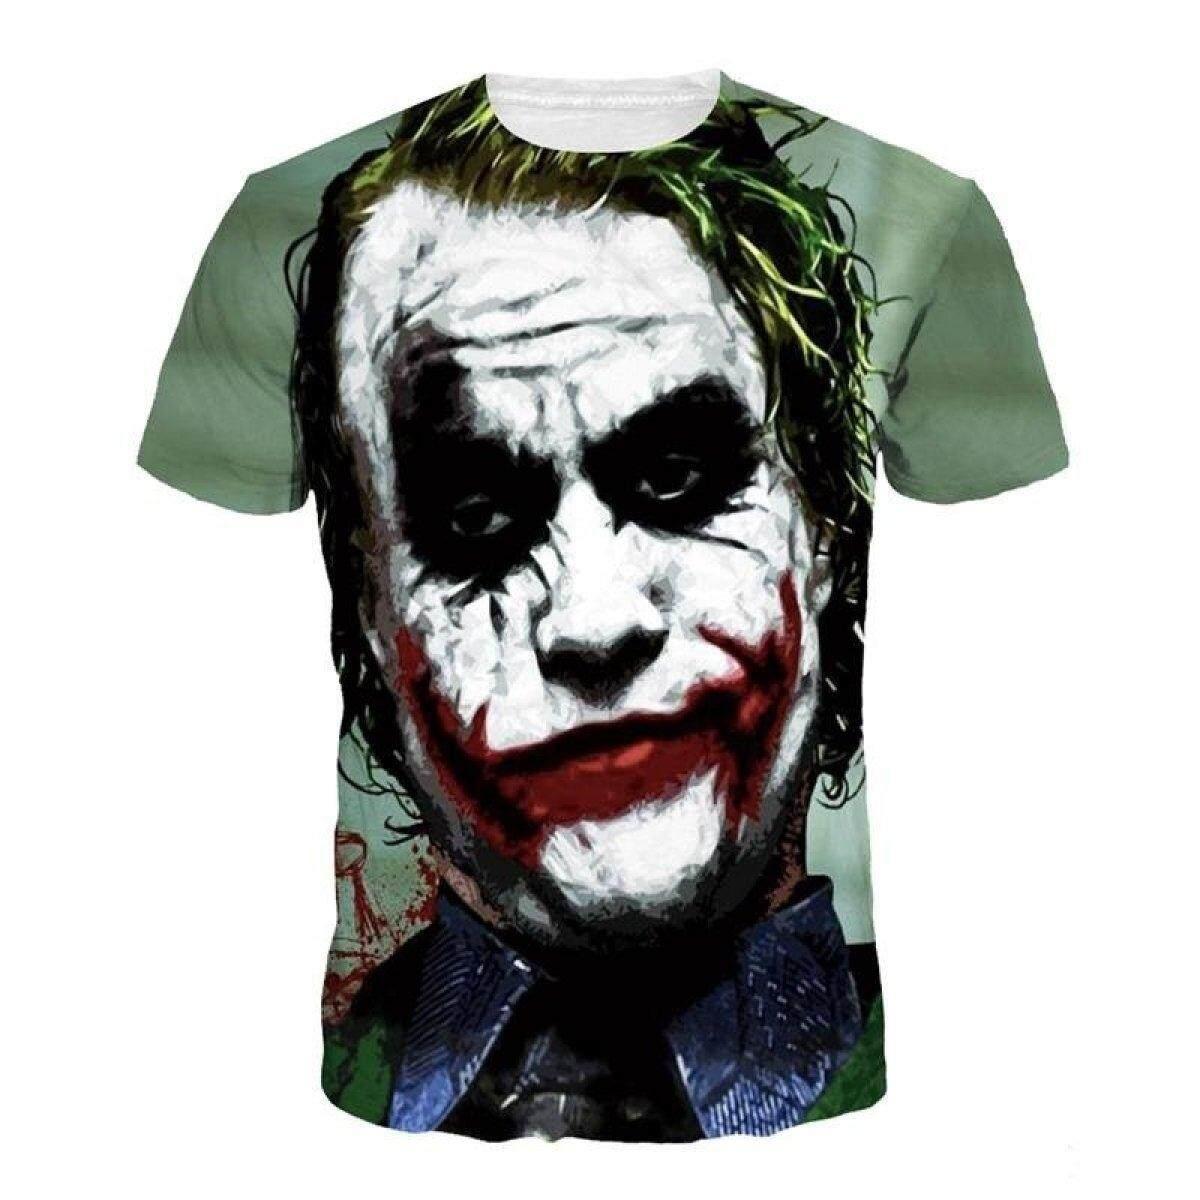 Jiayiqi Funny Joker Short Sleeve T-shirt Tops Summer Punk Print T-Shirts Clown